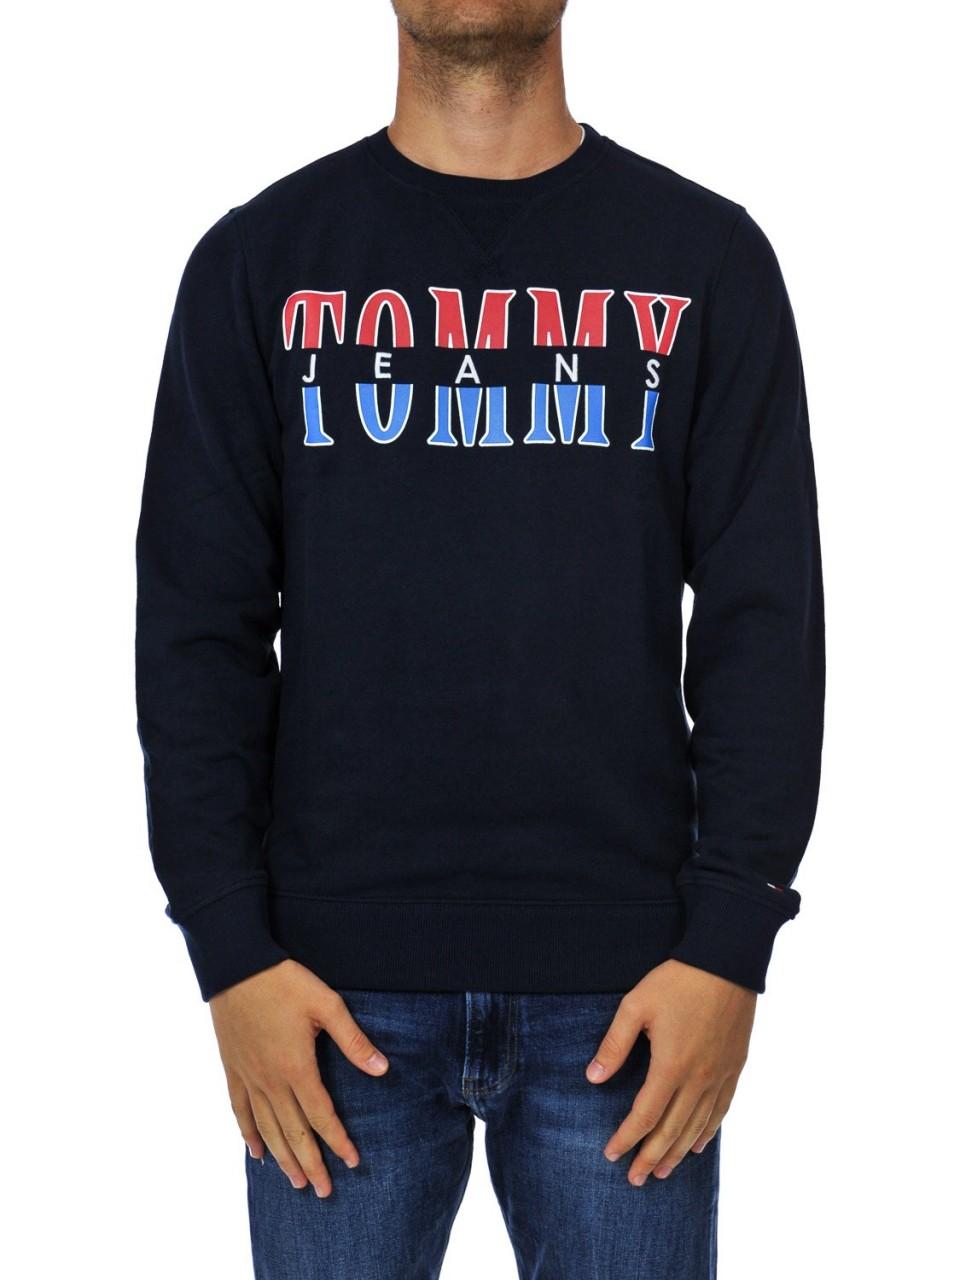 Tommy hilfiger Uomo Felpa Tommy Hilfiger Jeans Uomo Girocollo Logo 04461I